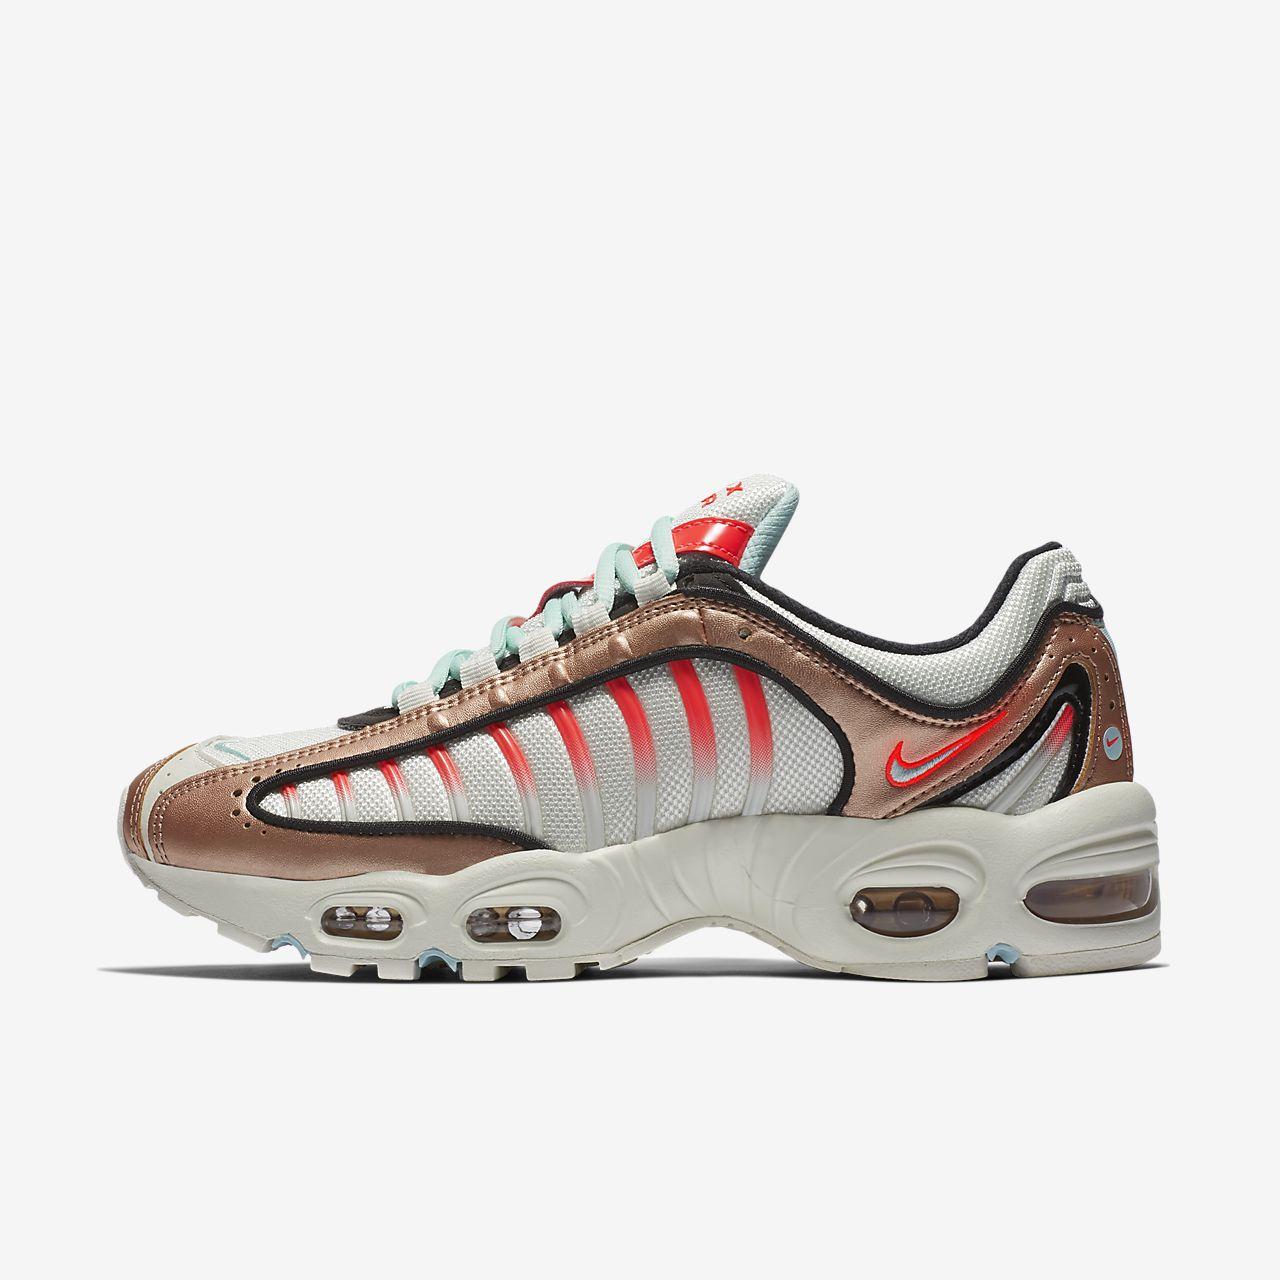 Nike Air Max Tailwind IV Women's Shoe